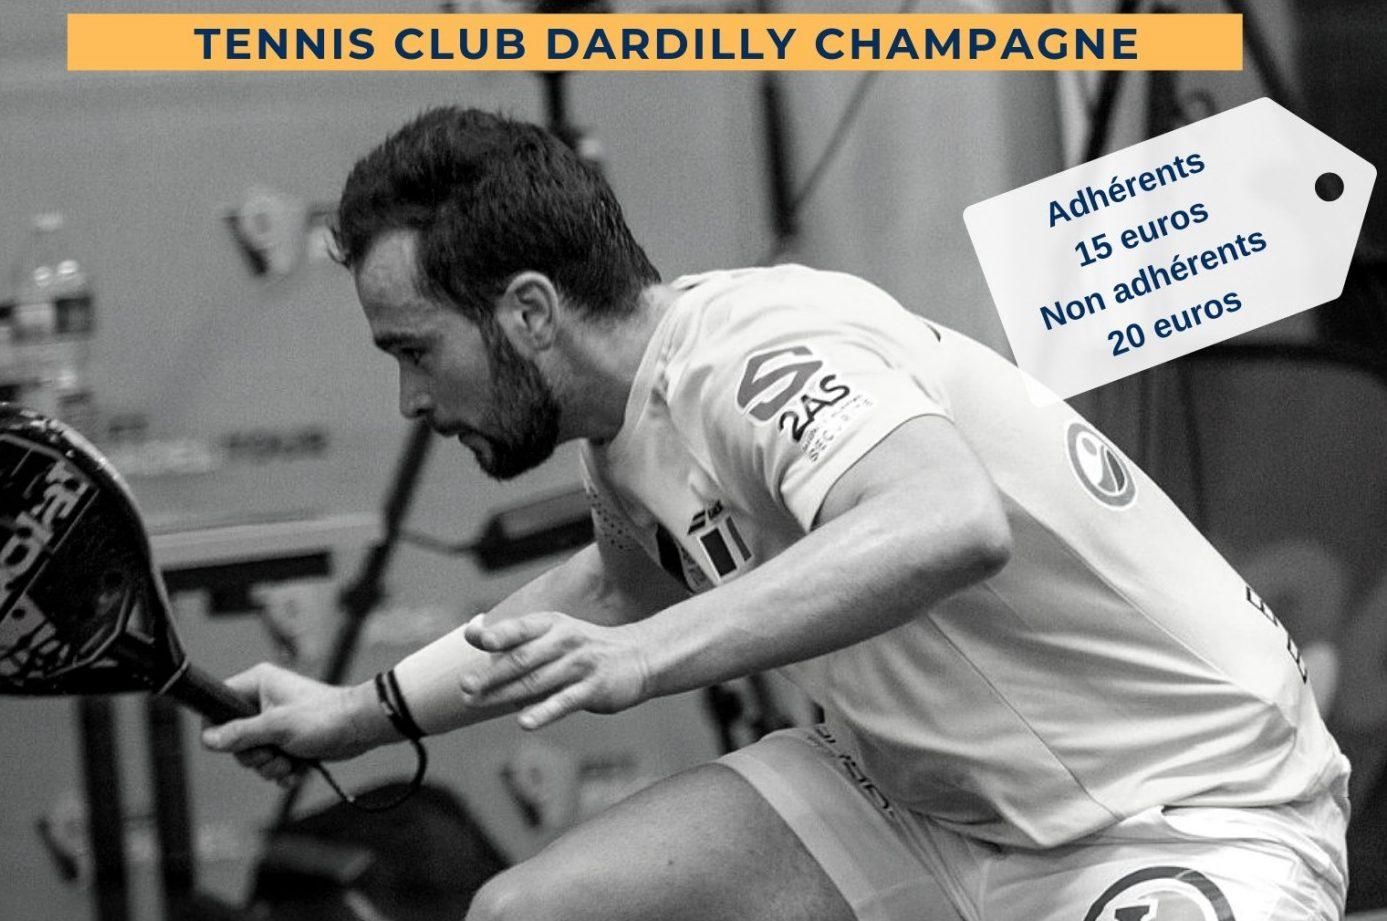 P100 Trans Mat Sud en juillet au TC Dardilly-Champagne